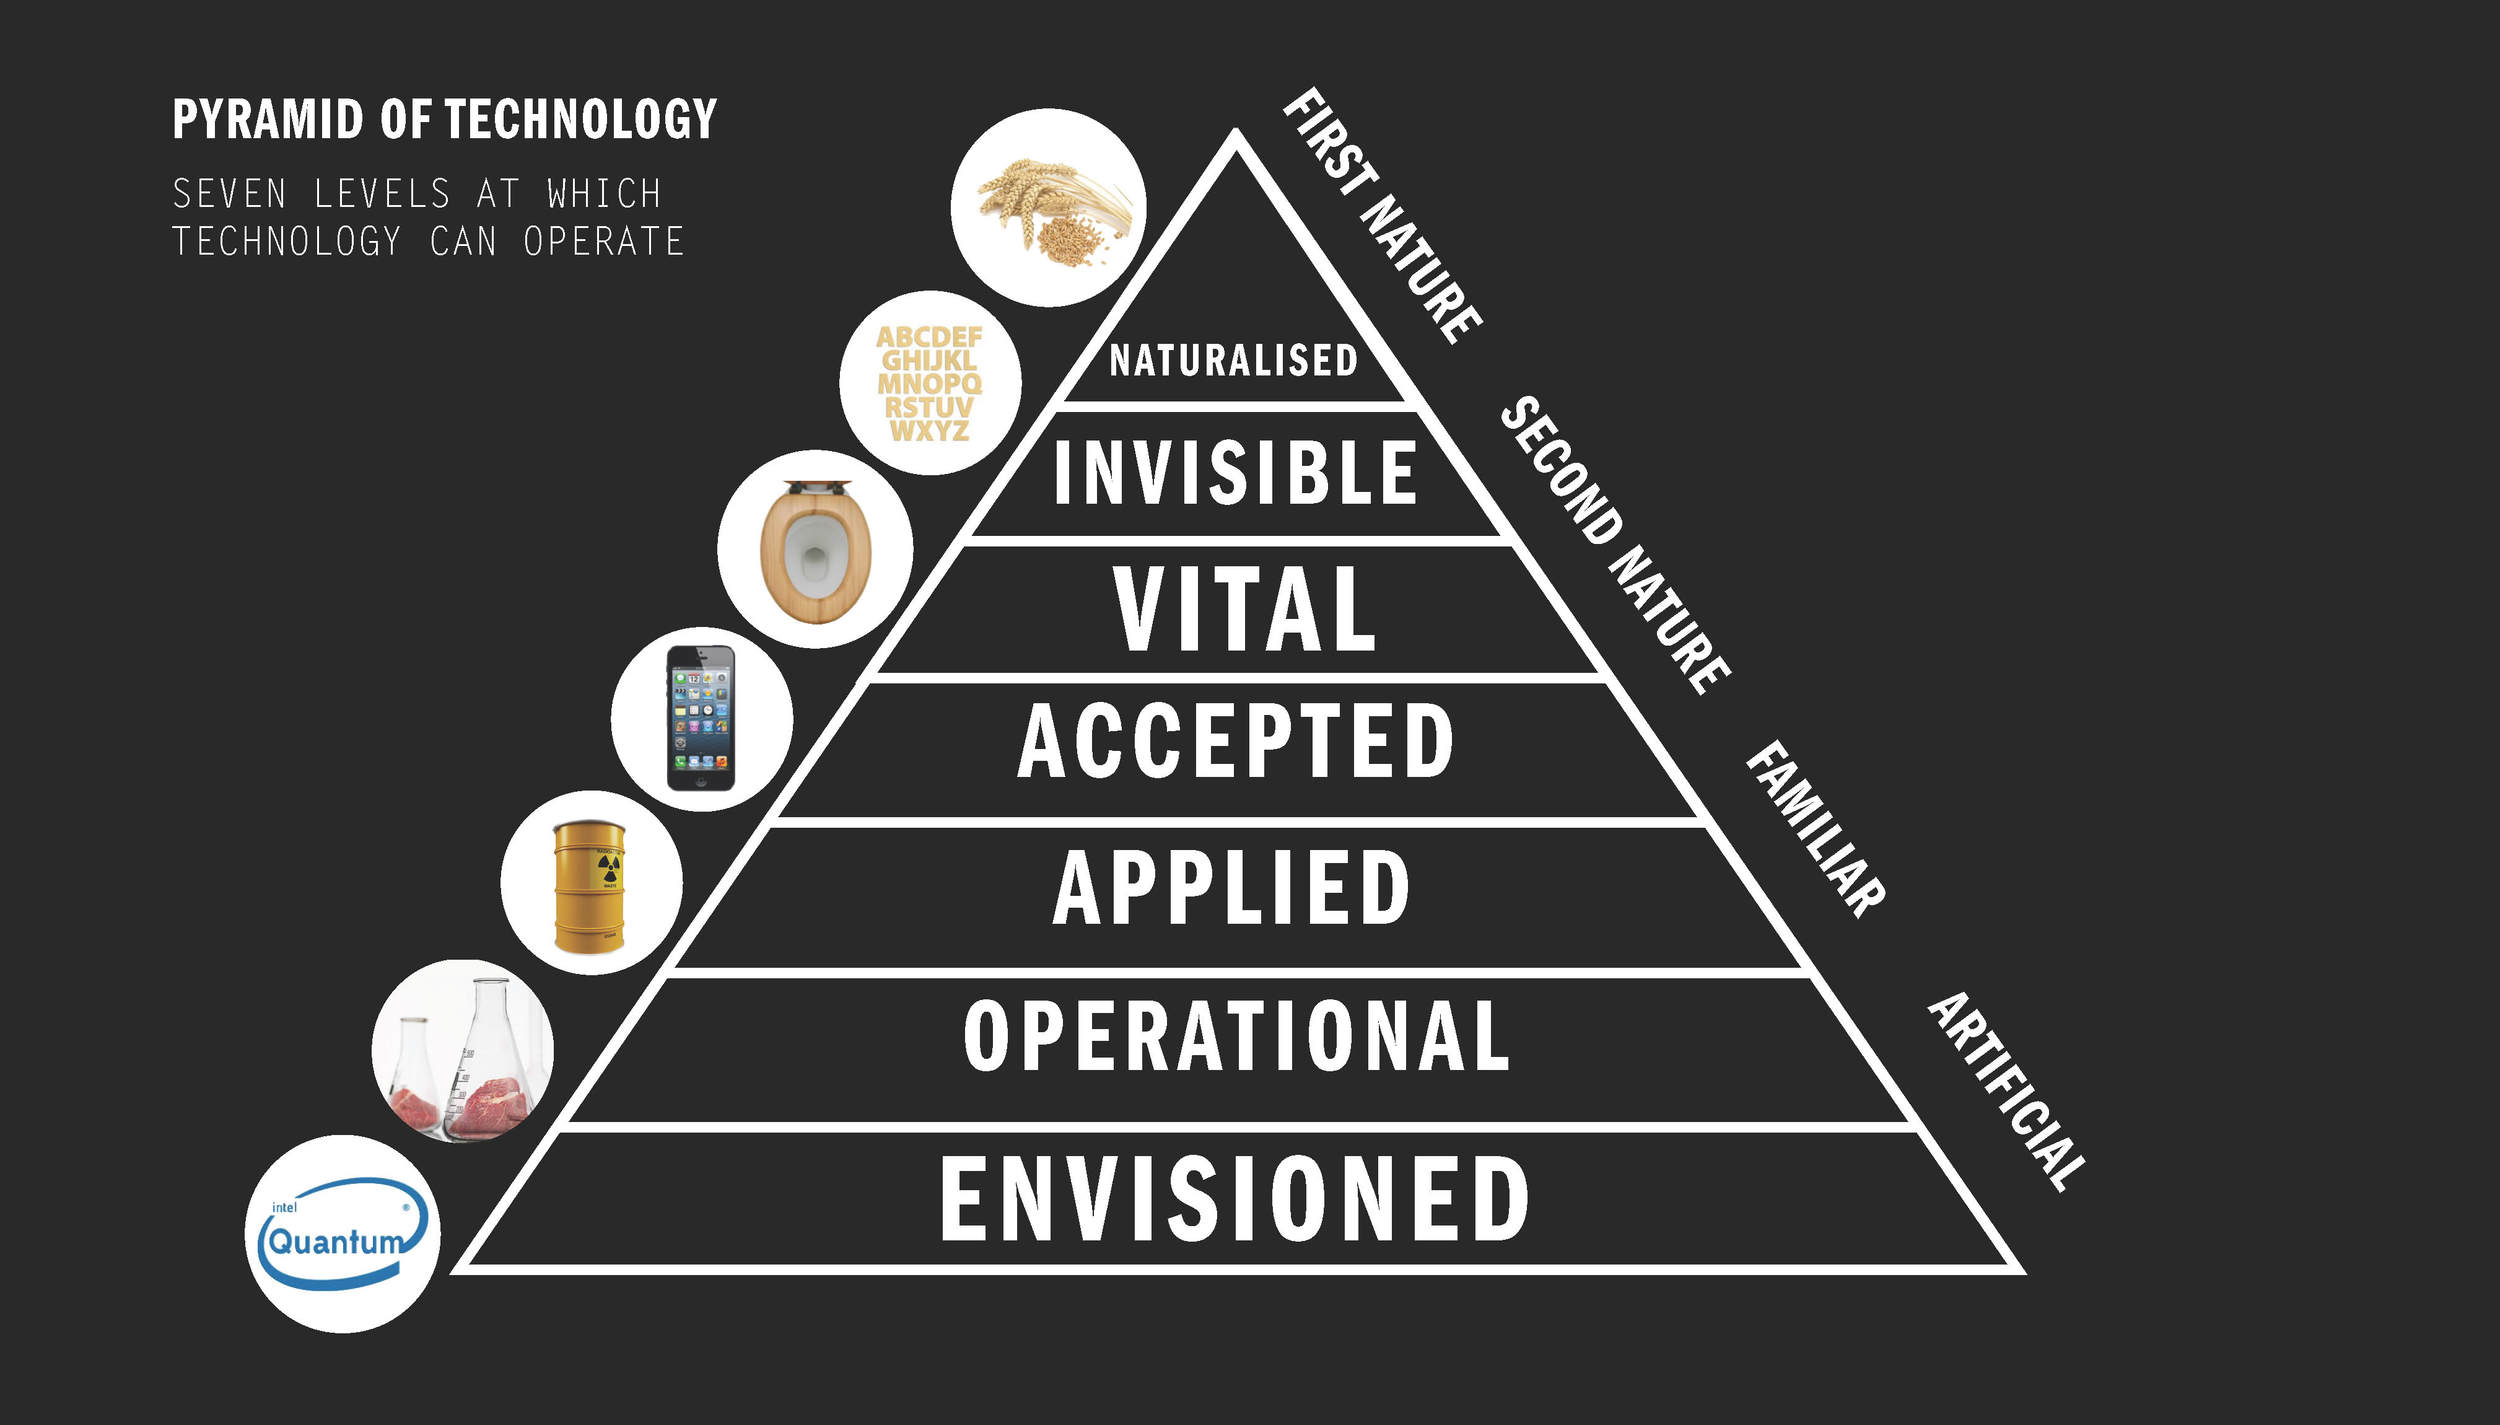 NATURE3X_KvM Pyramid of Technology